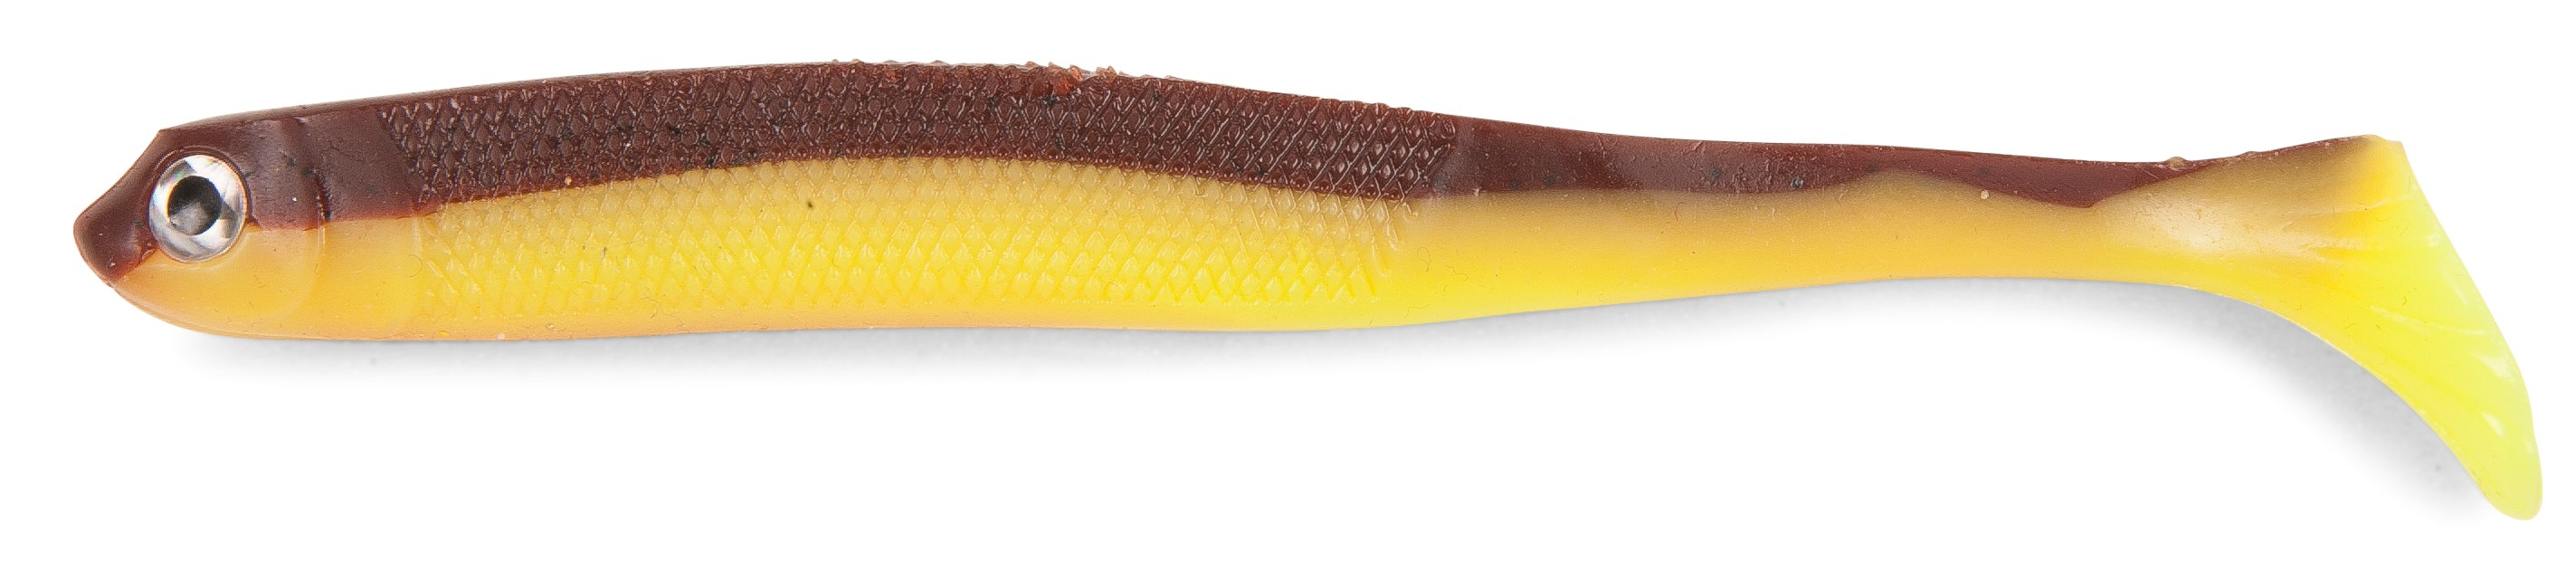 Iron Claw gumová nástraha Slim Jim 13 cm Vzor BC, 3 ks